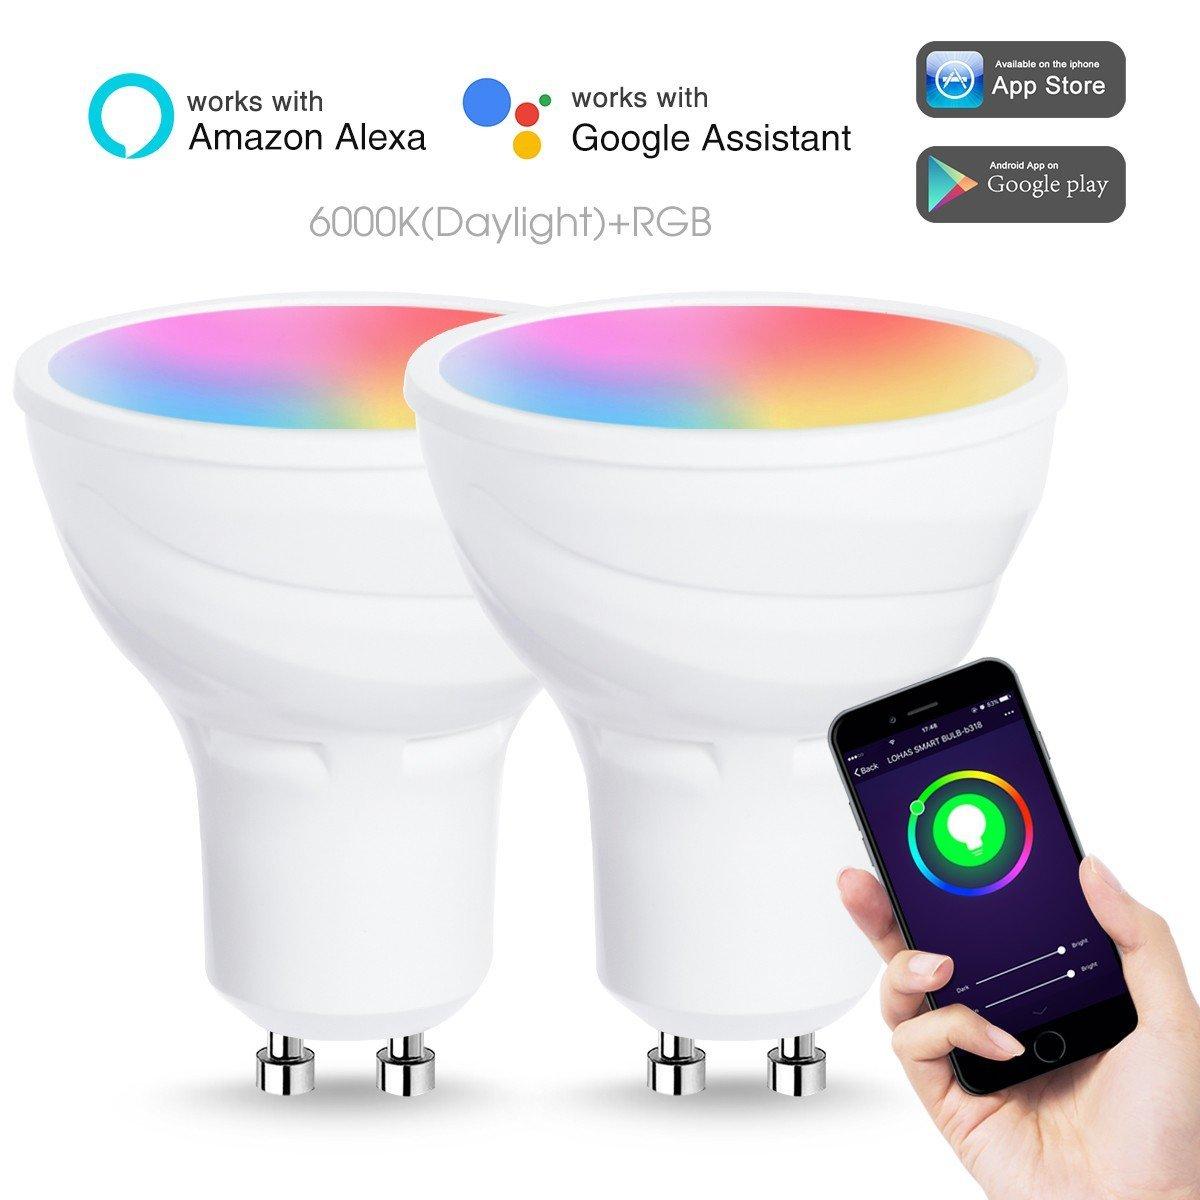 iphone controlled lighting. LOHAS LED Smart Bulbs Wifi GU10 ,Alexa,color Changing Lights, 2 Pack Iphone Controlled Lighting